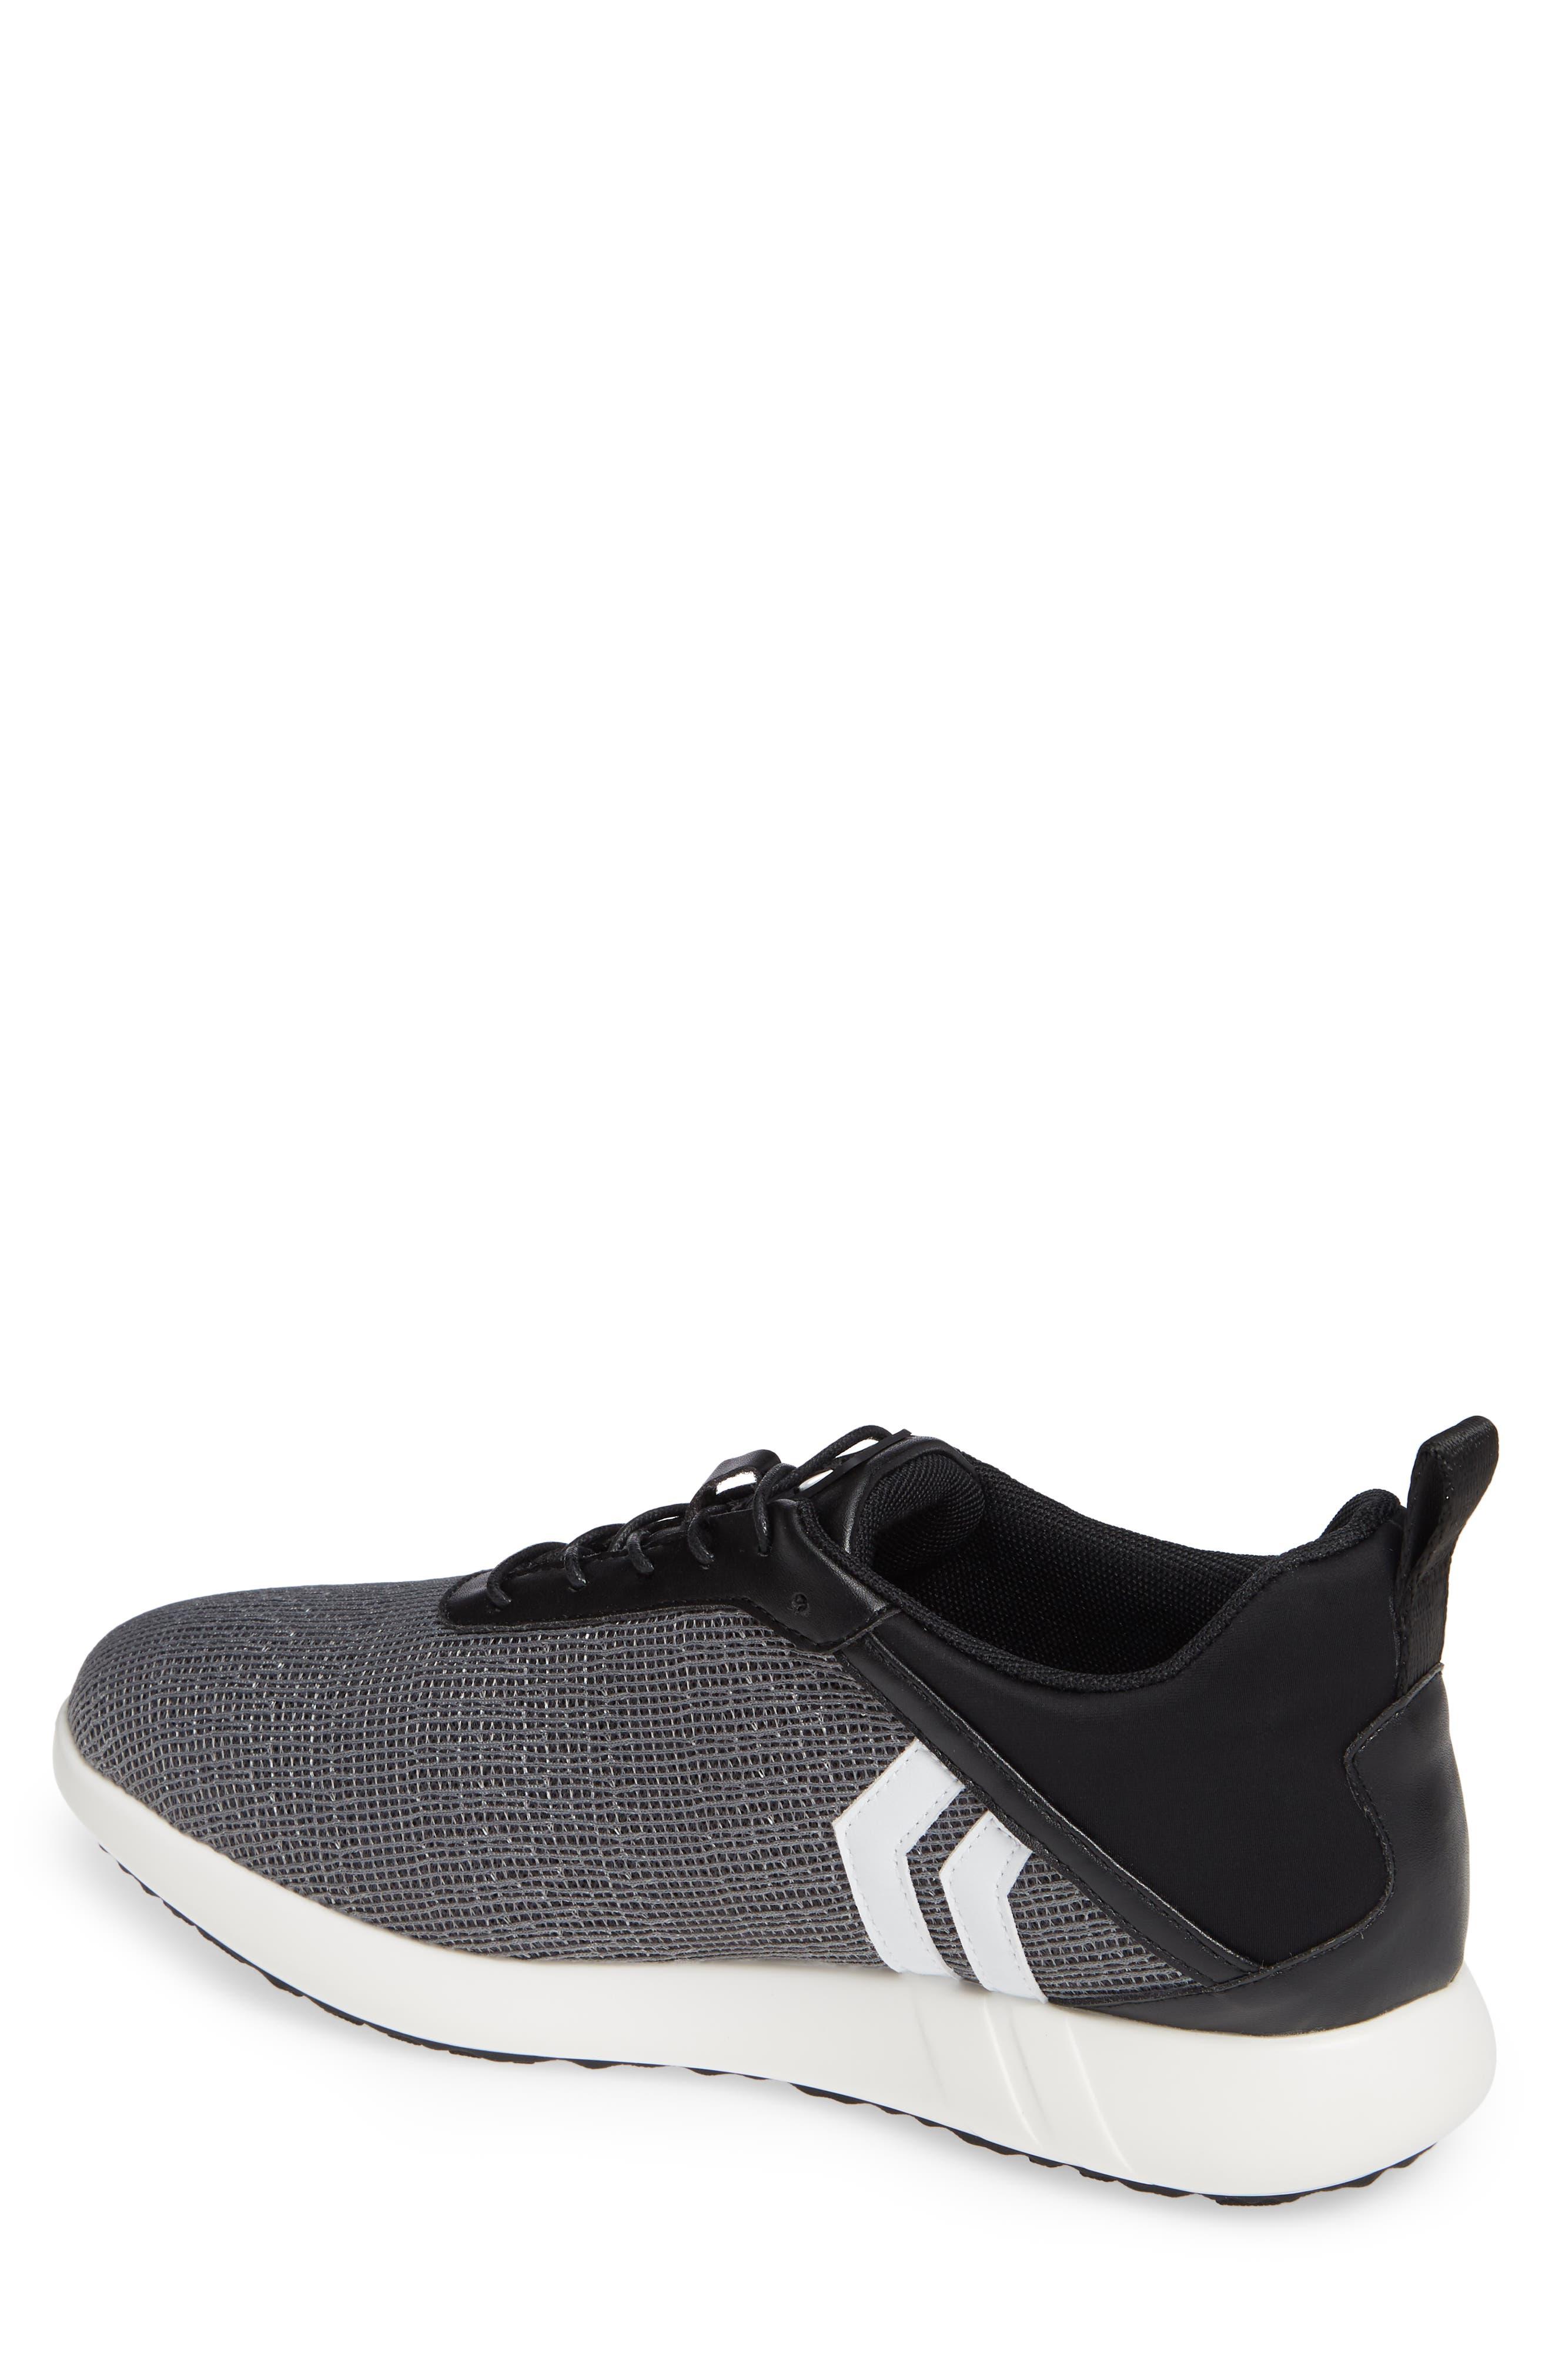 Foam Sneaker,                             Alternate thumbnail 2, color,                             021